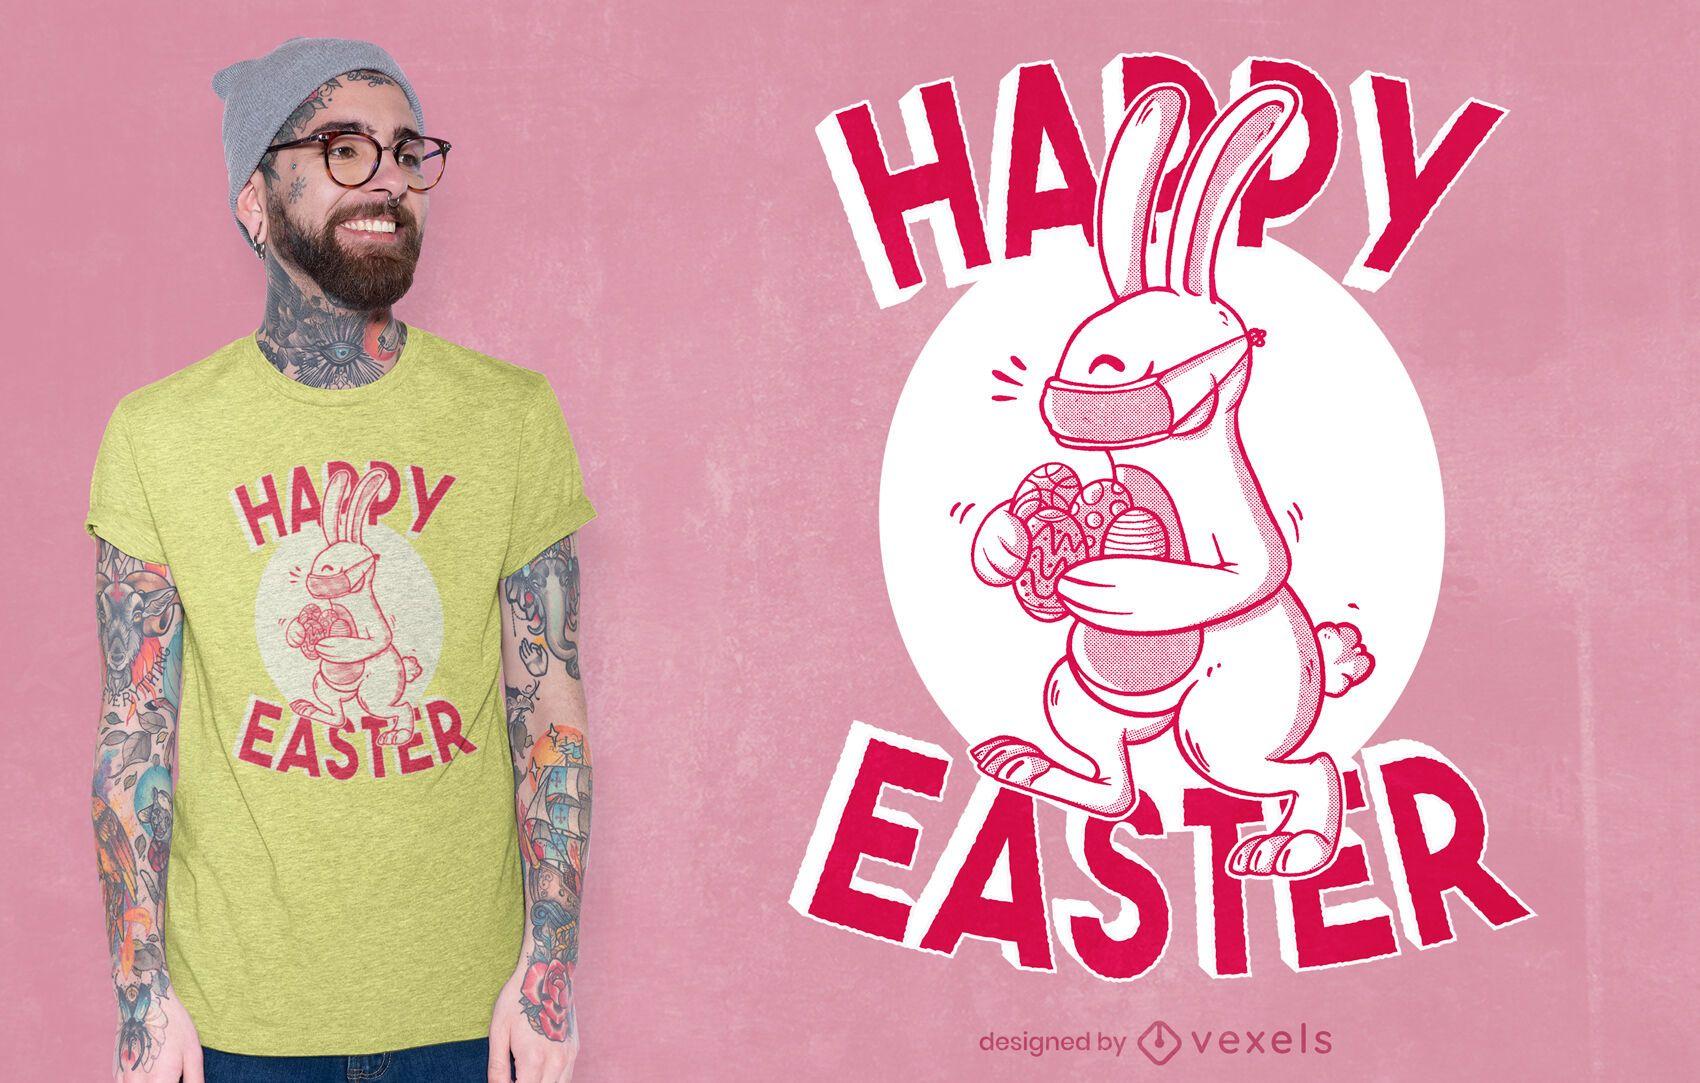 Face mask easter bunny t-shirt design